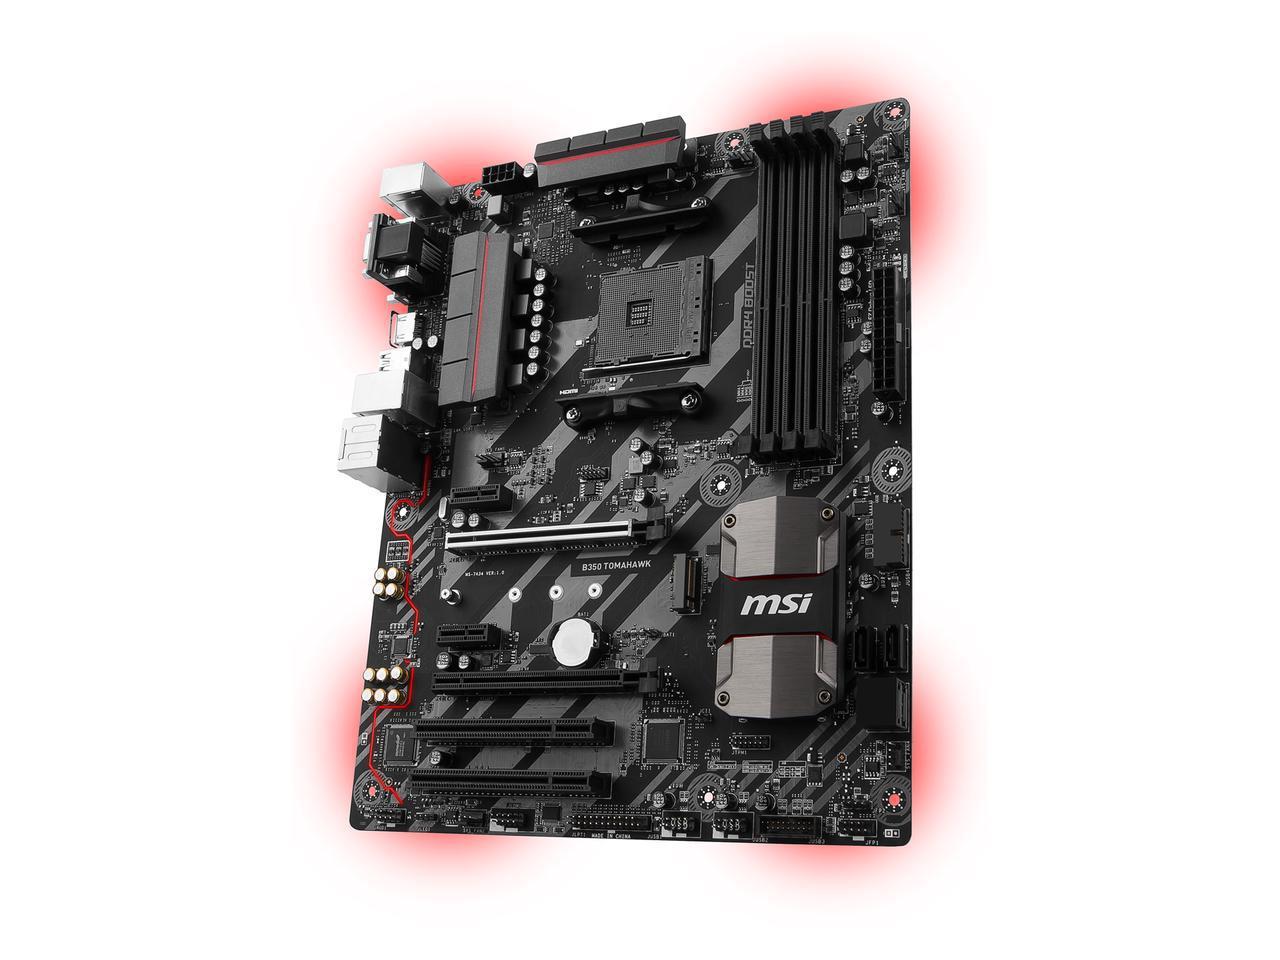 MSI B350 TOMAHAWK AM4 AMD ATX Motherboard + MSI Interceptor DS B1 Gaming Mouse $64.99 AR